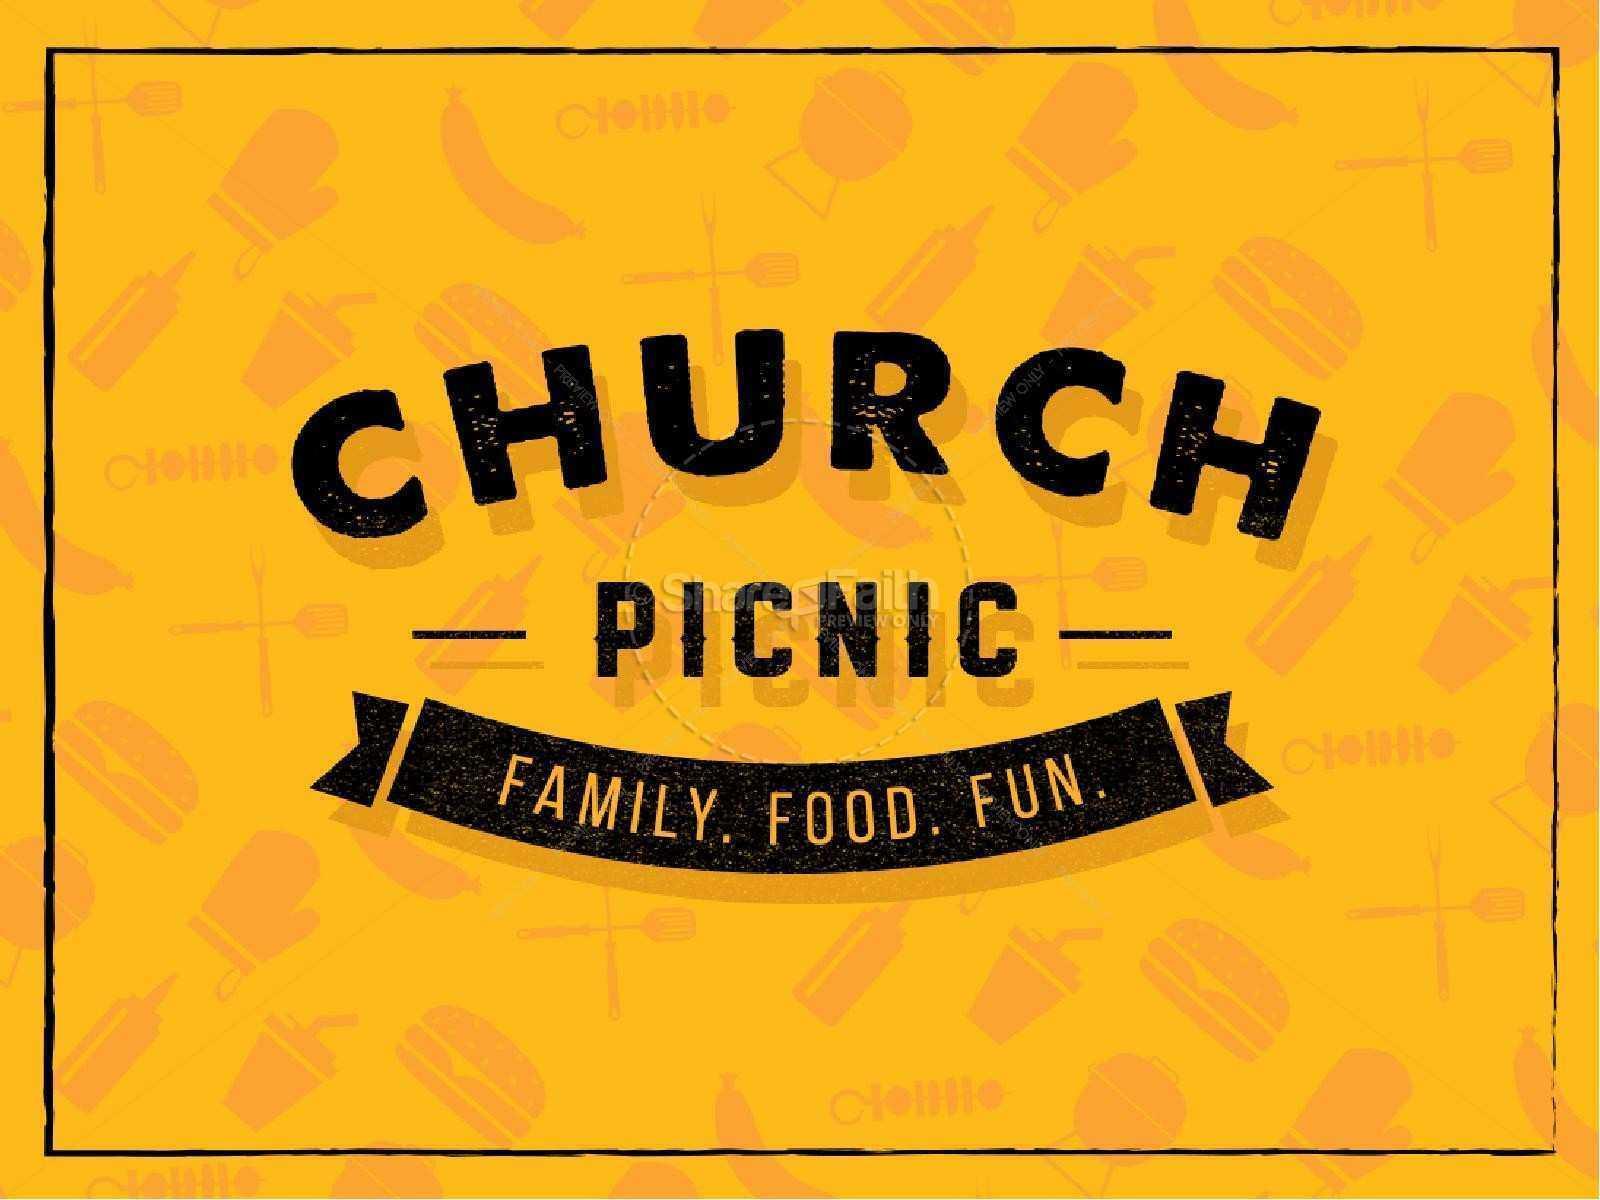 Church Picnic Flyer Templates - Cards Design Templates Inside Church Picnic Flyer Templates